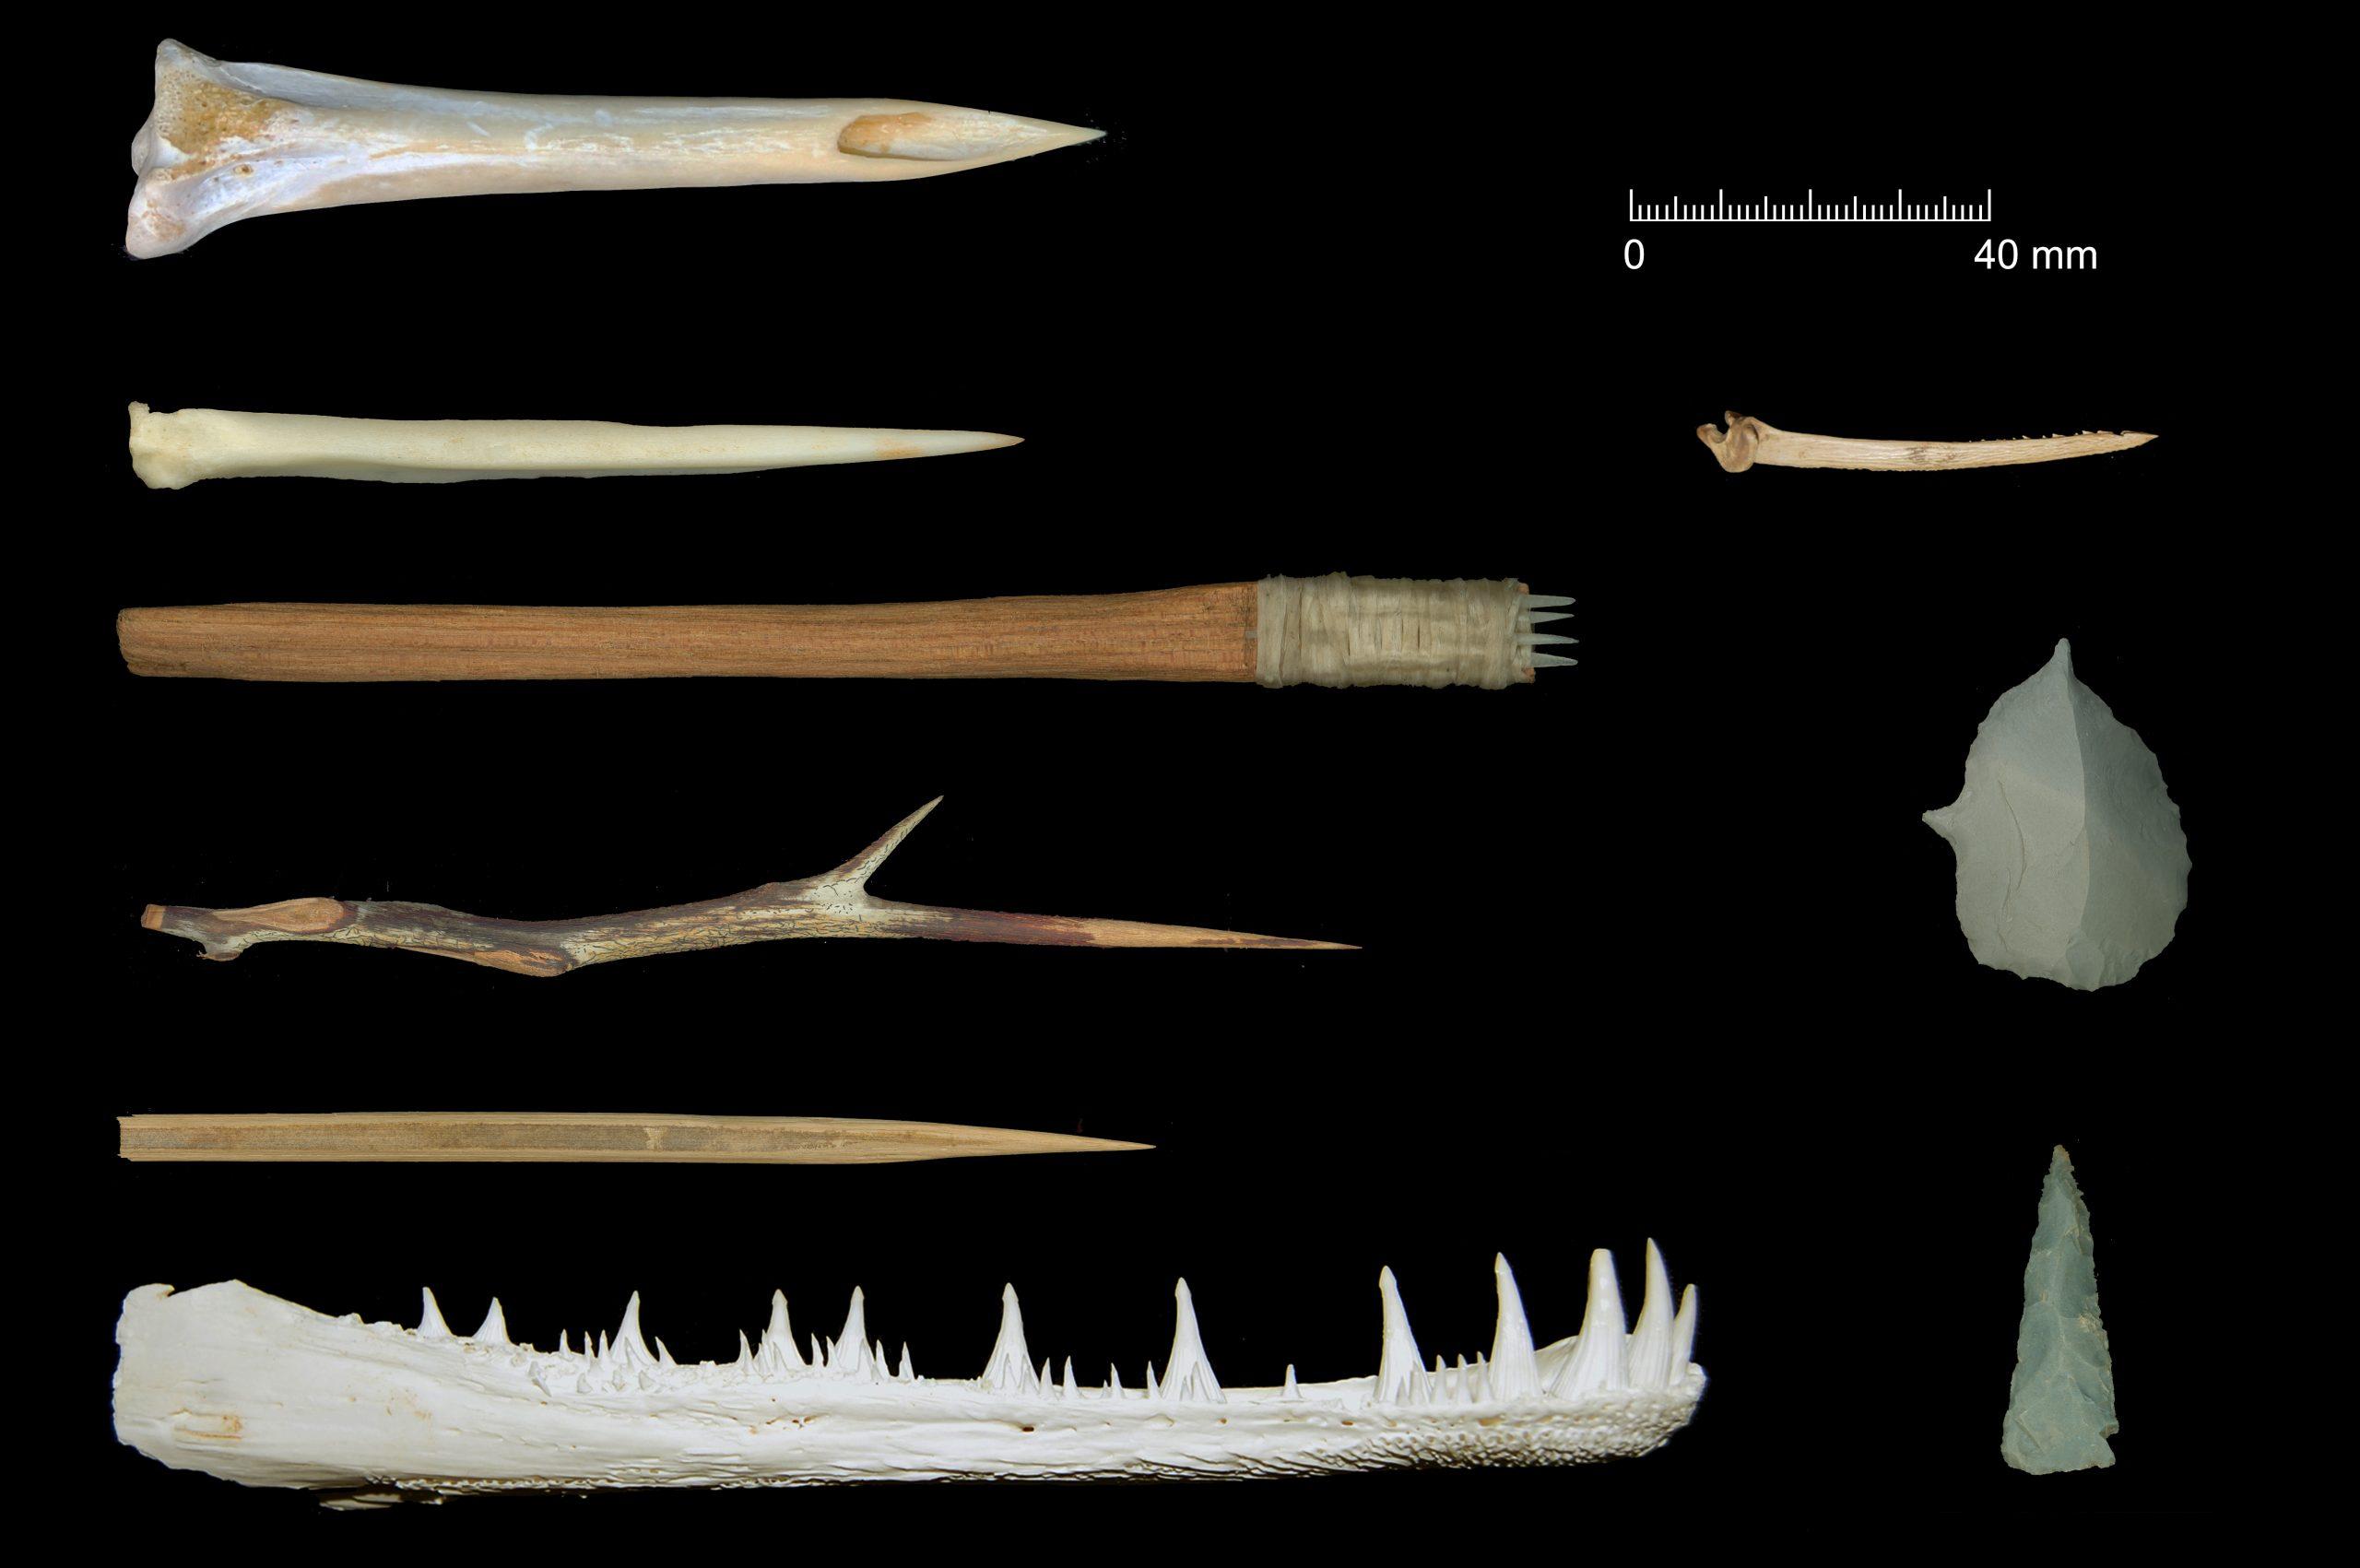 Replica Tools Tattoo Needles Native American 16th C